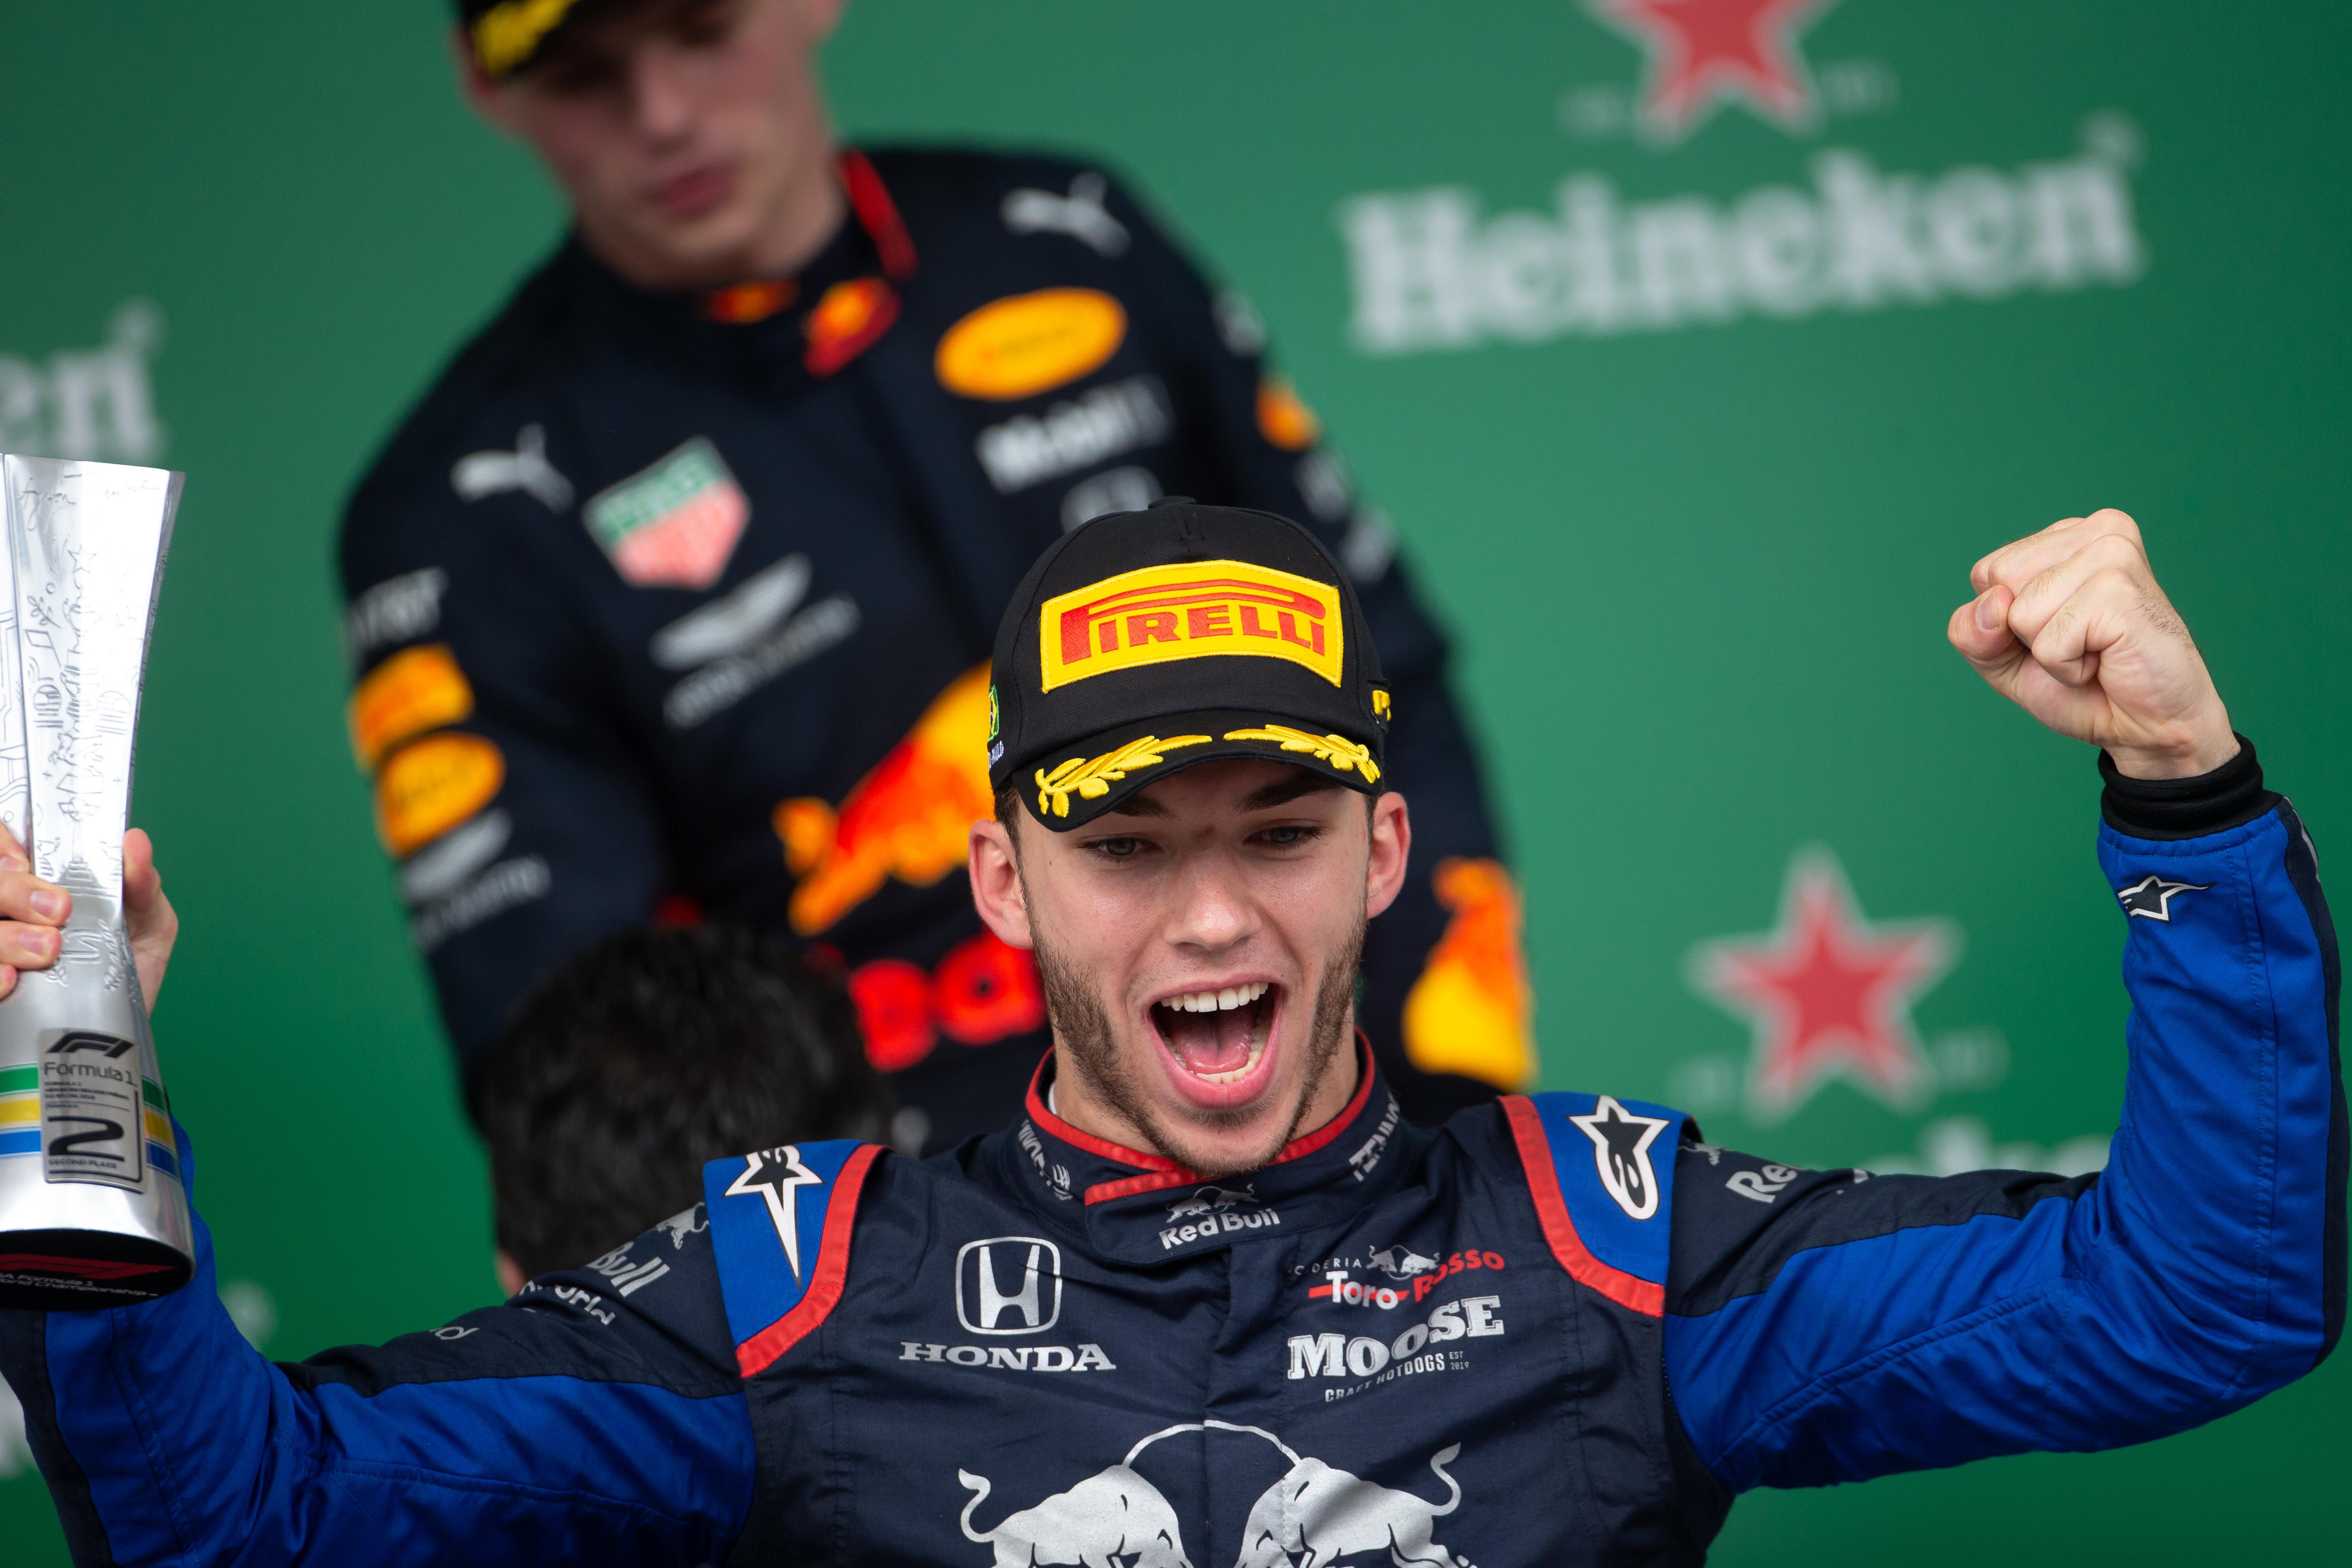 Pierre Gasly Brazilian Grand Prix podium 2019